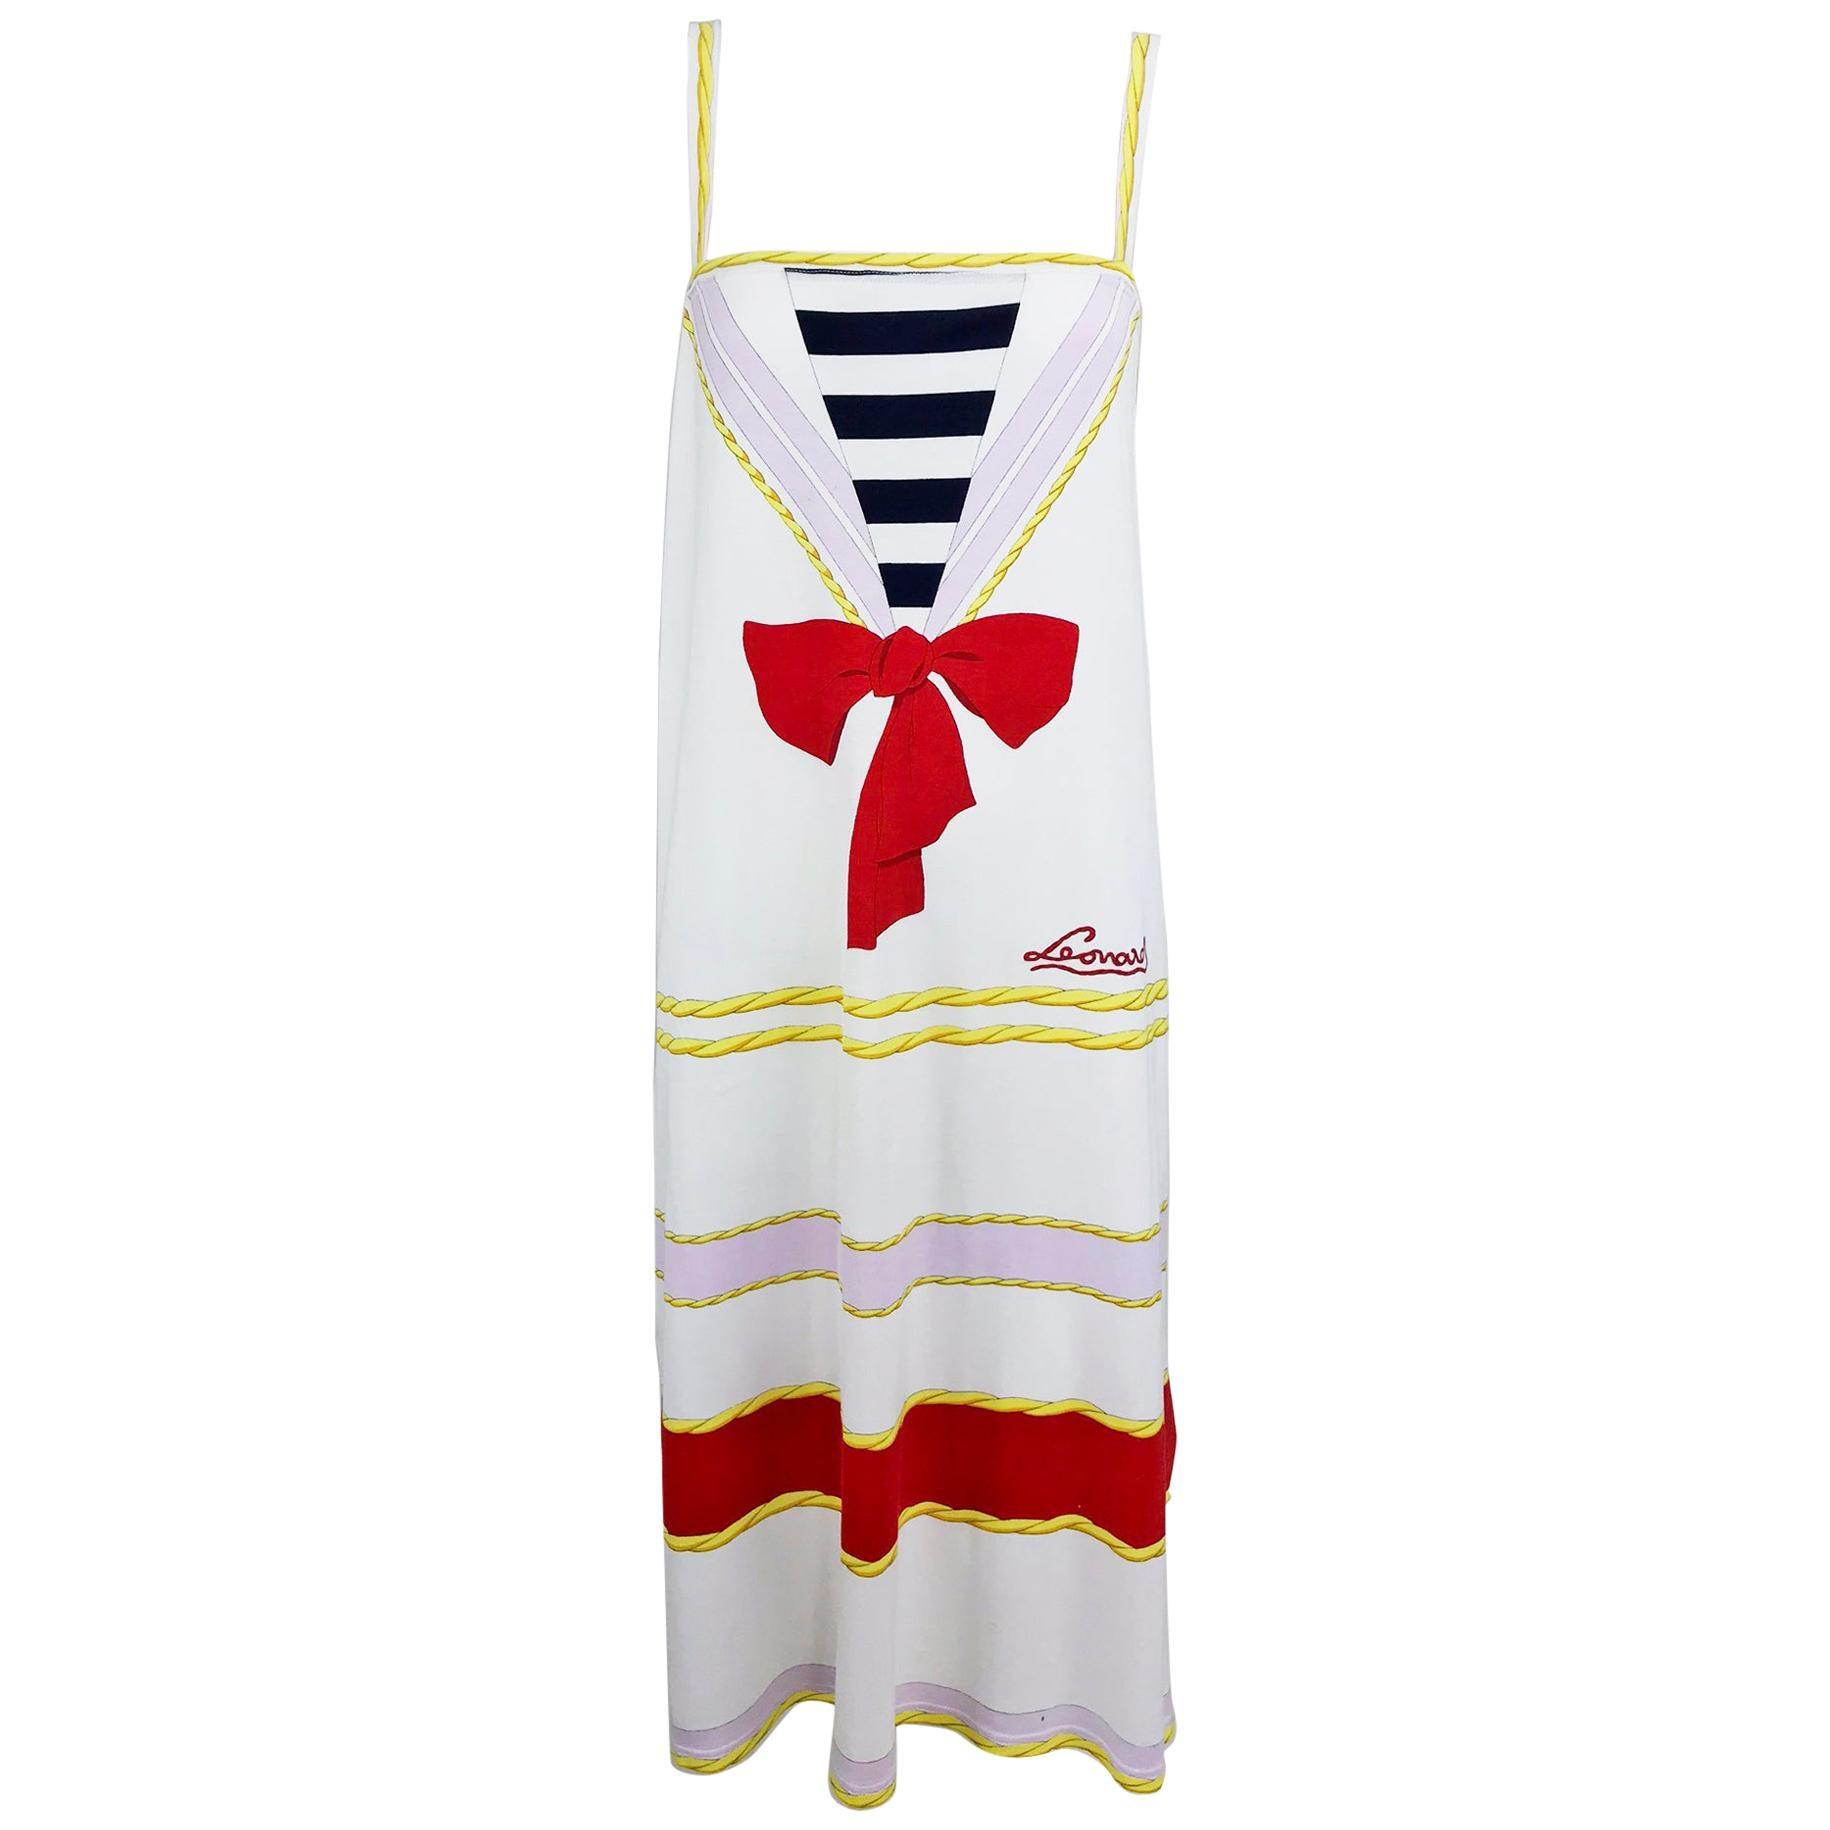 Leonard Paris Novelty Printed Cotton Knit Sun Dress 1980s